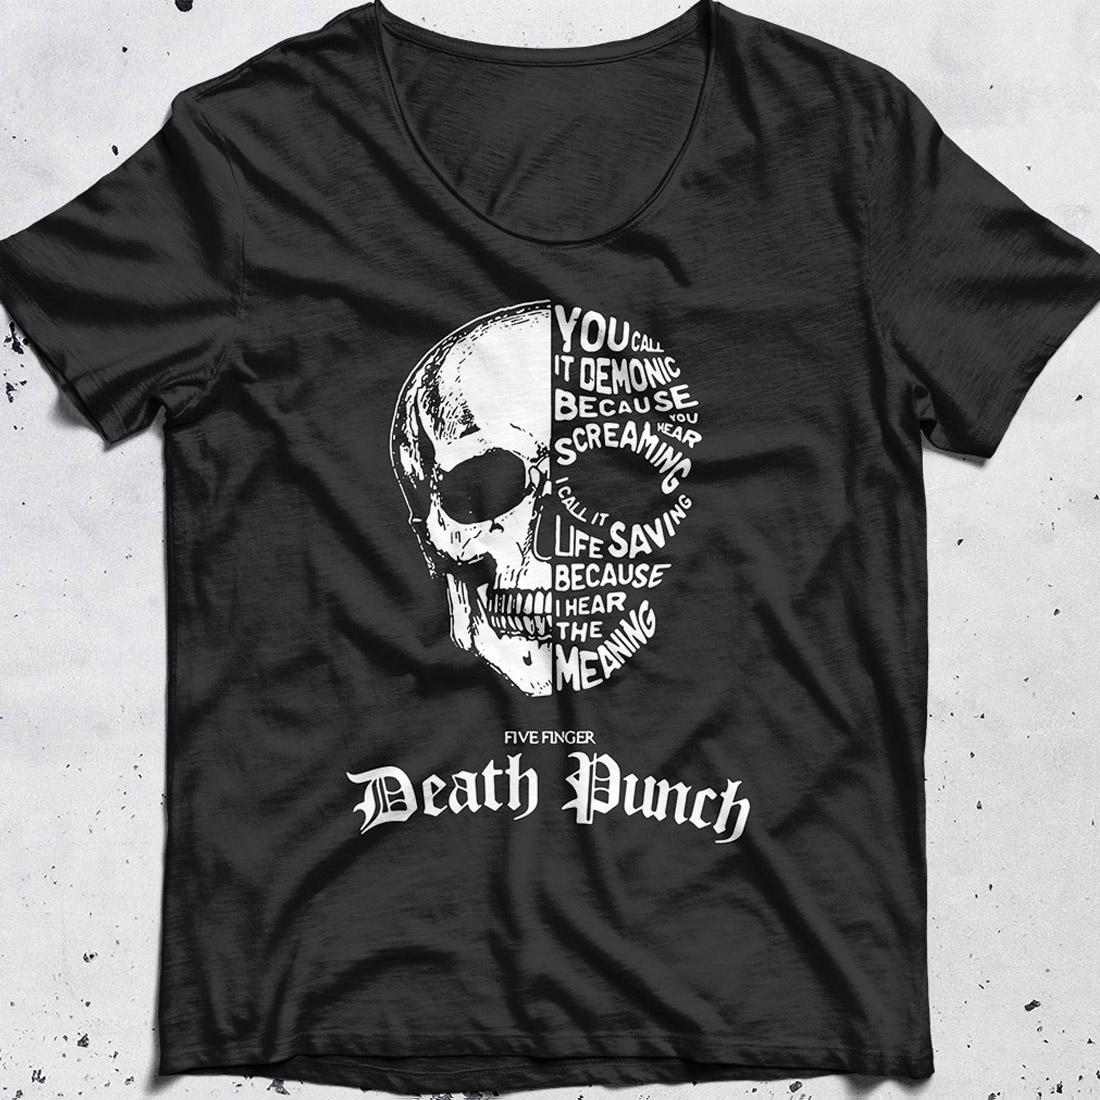 Dead Punch You call it demonic because you hear screaming shirt